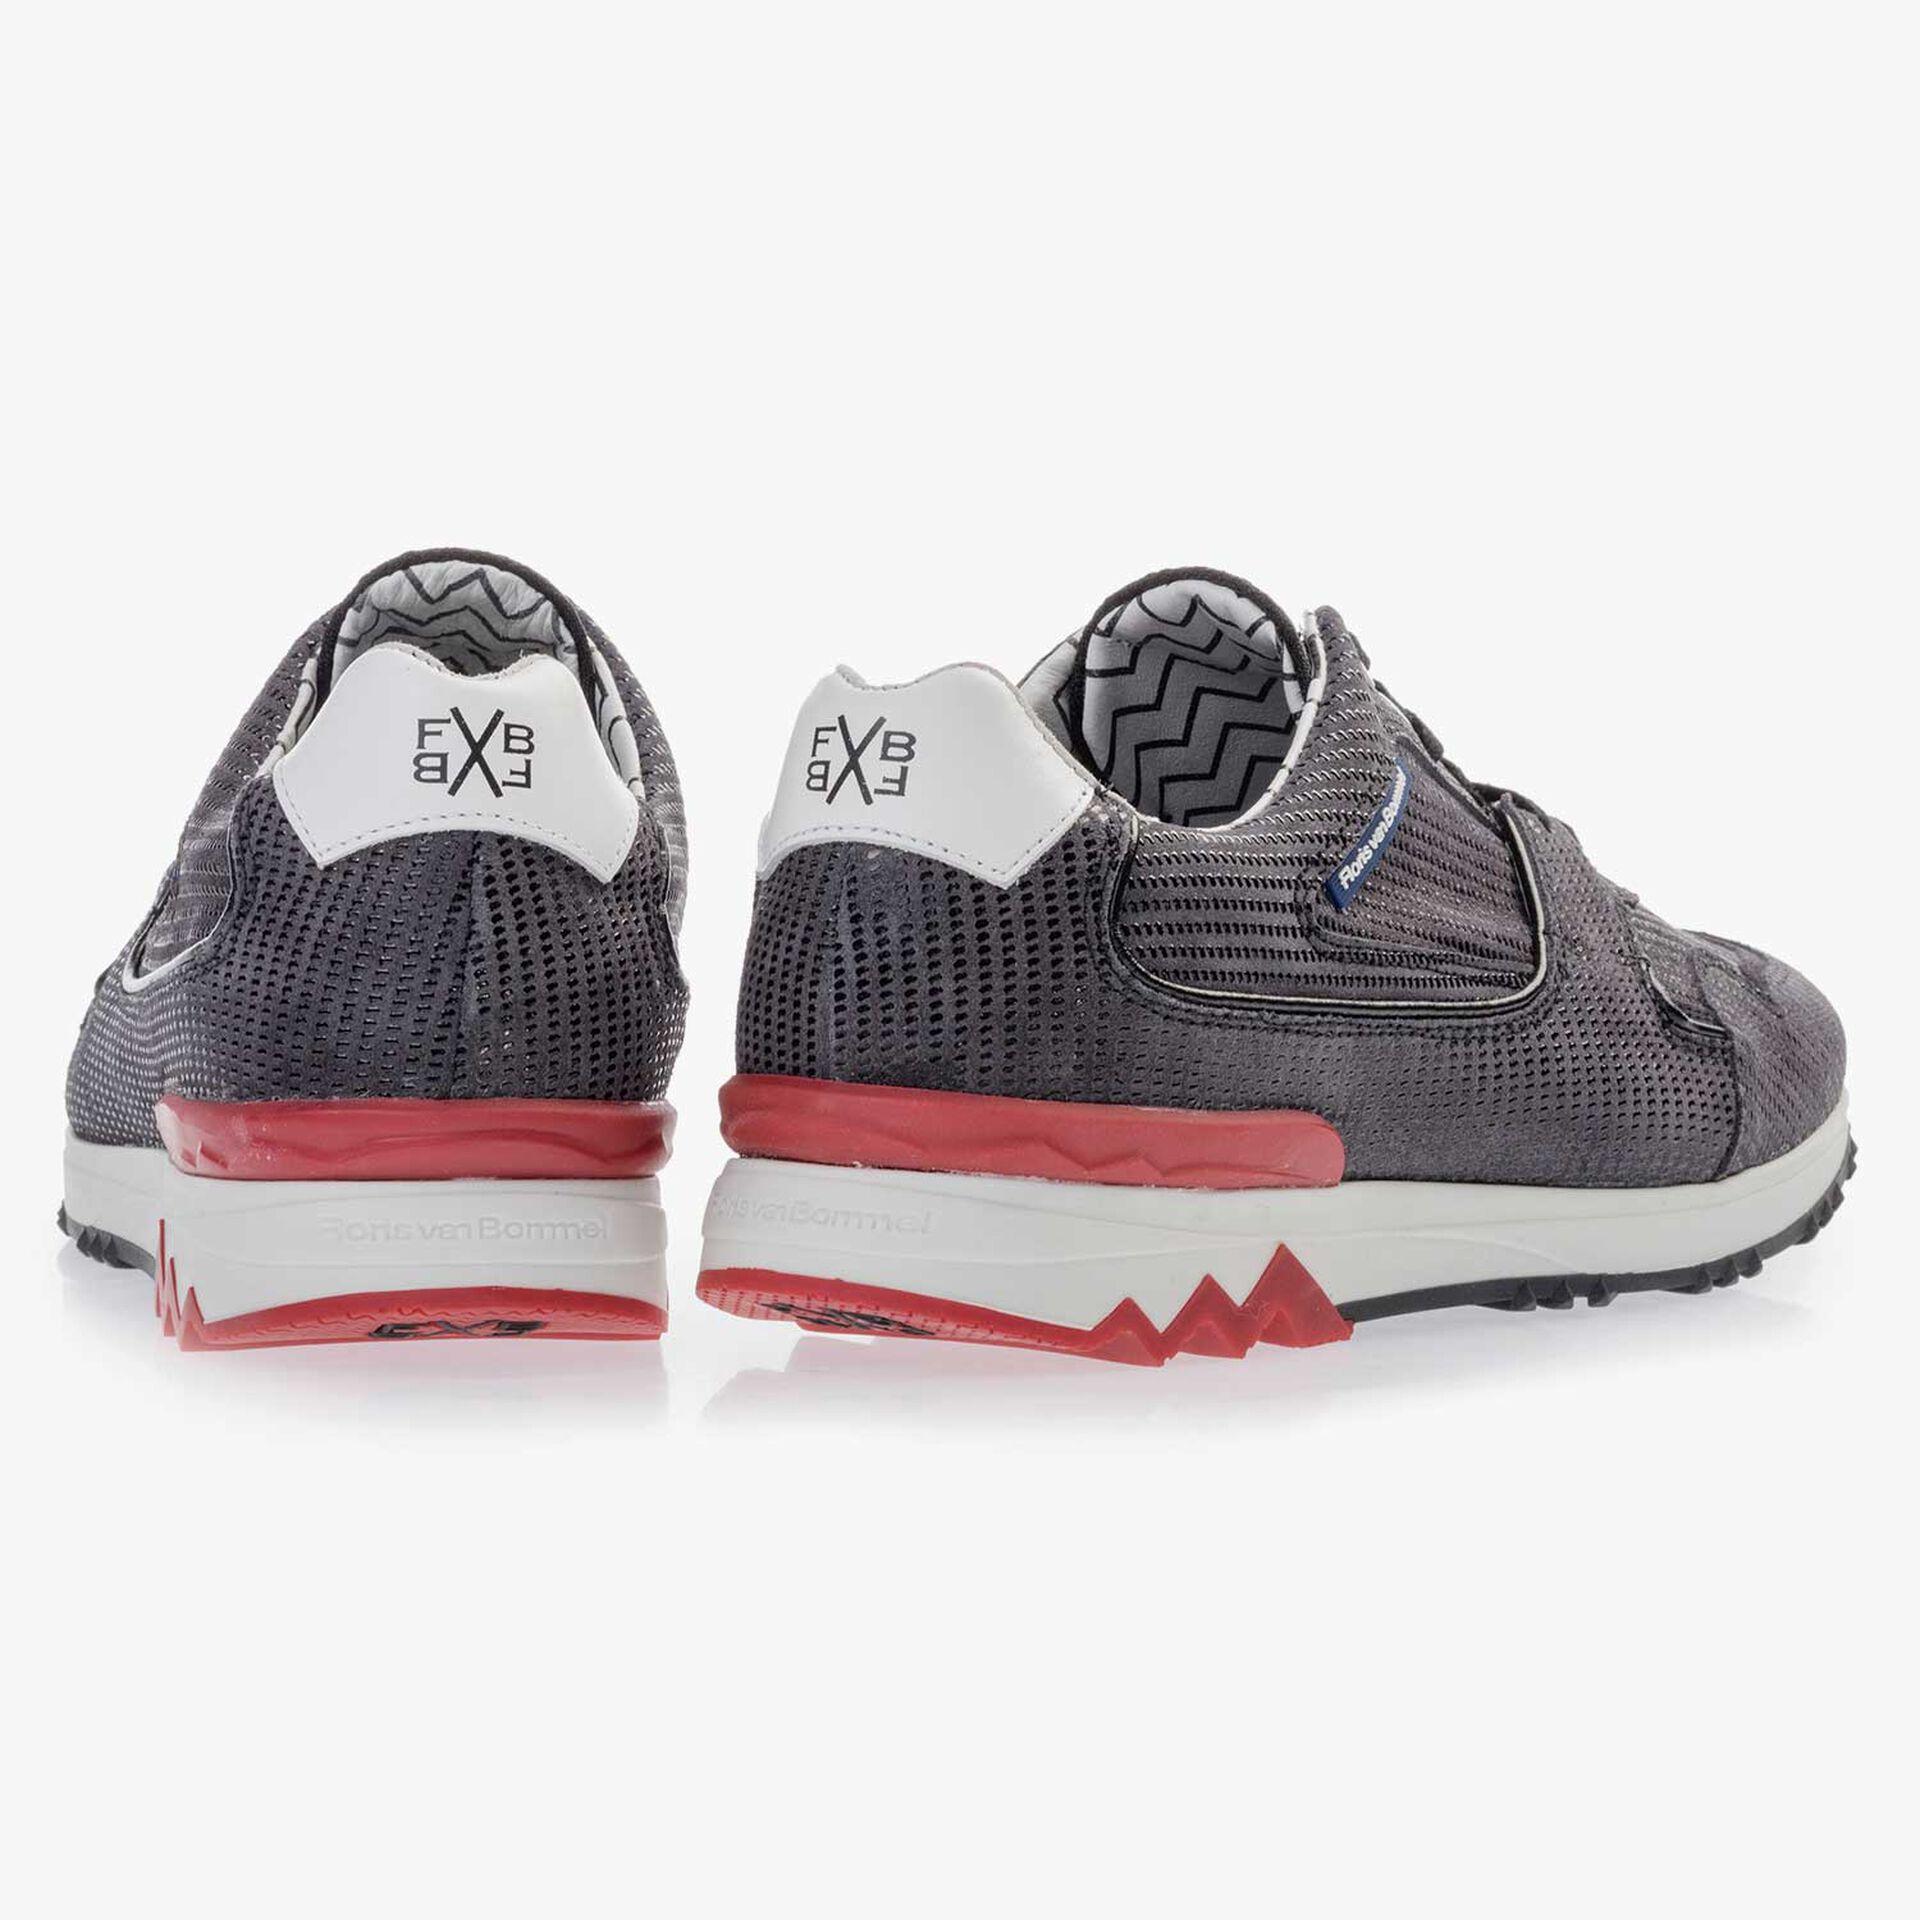 Dark grey, patterned leather sneaker